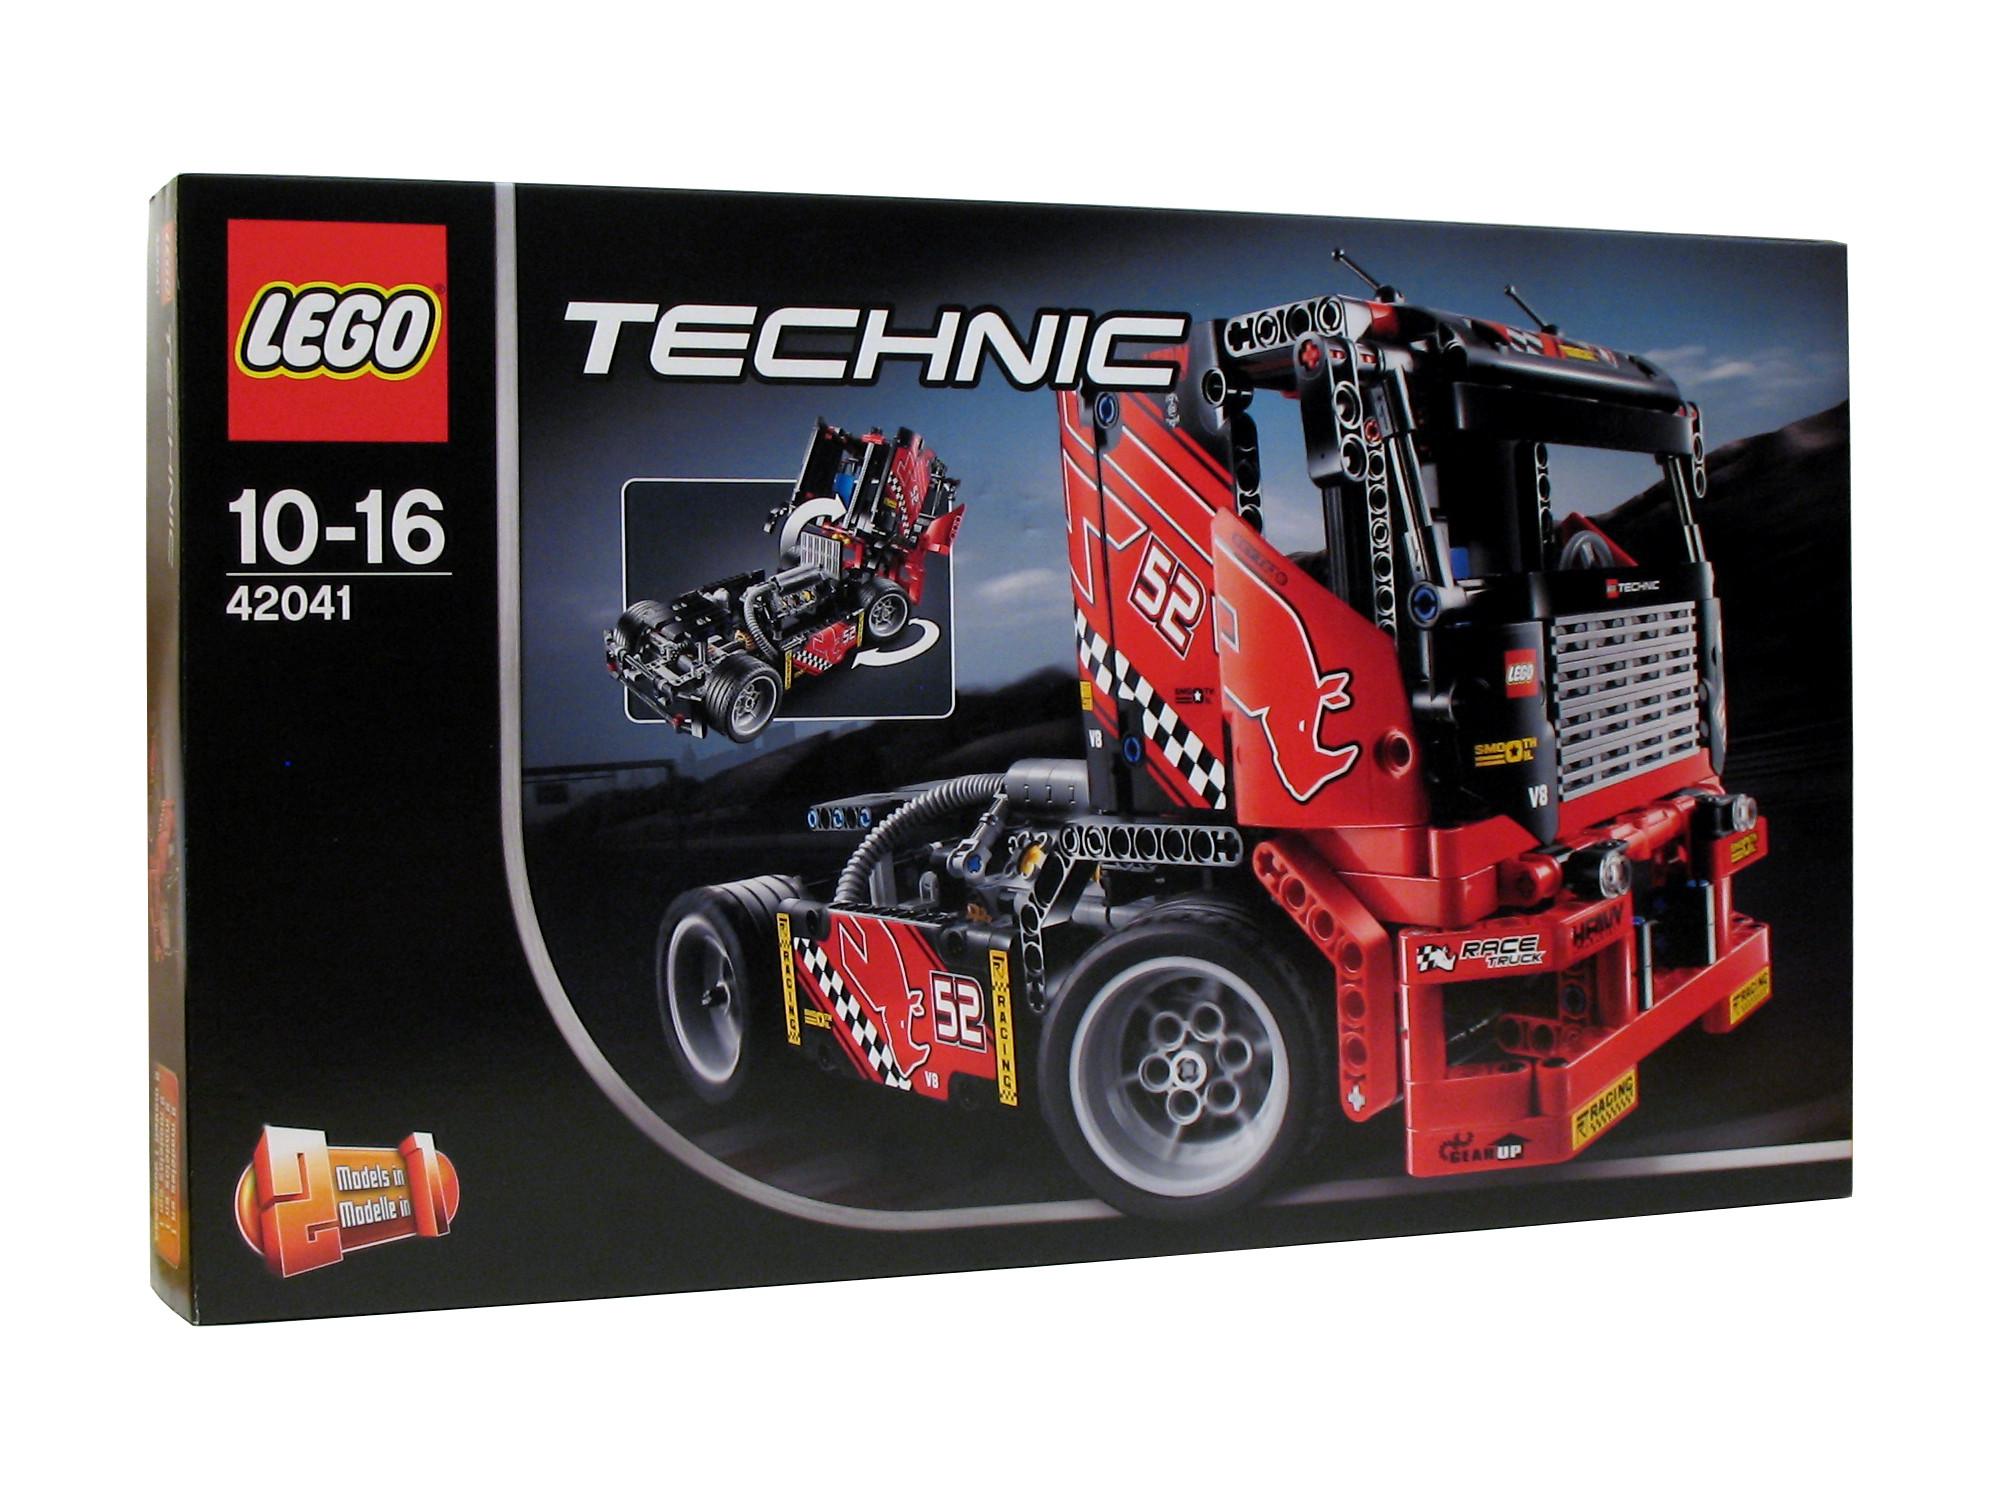 lego technic 42041 instructions